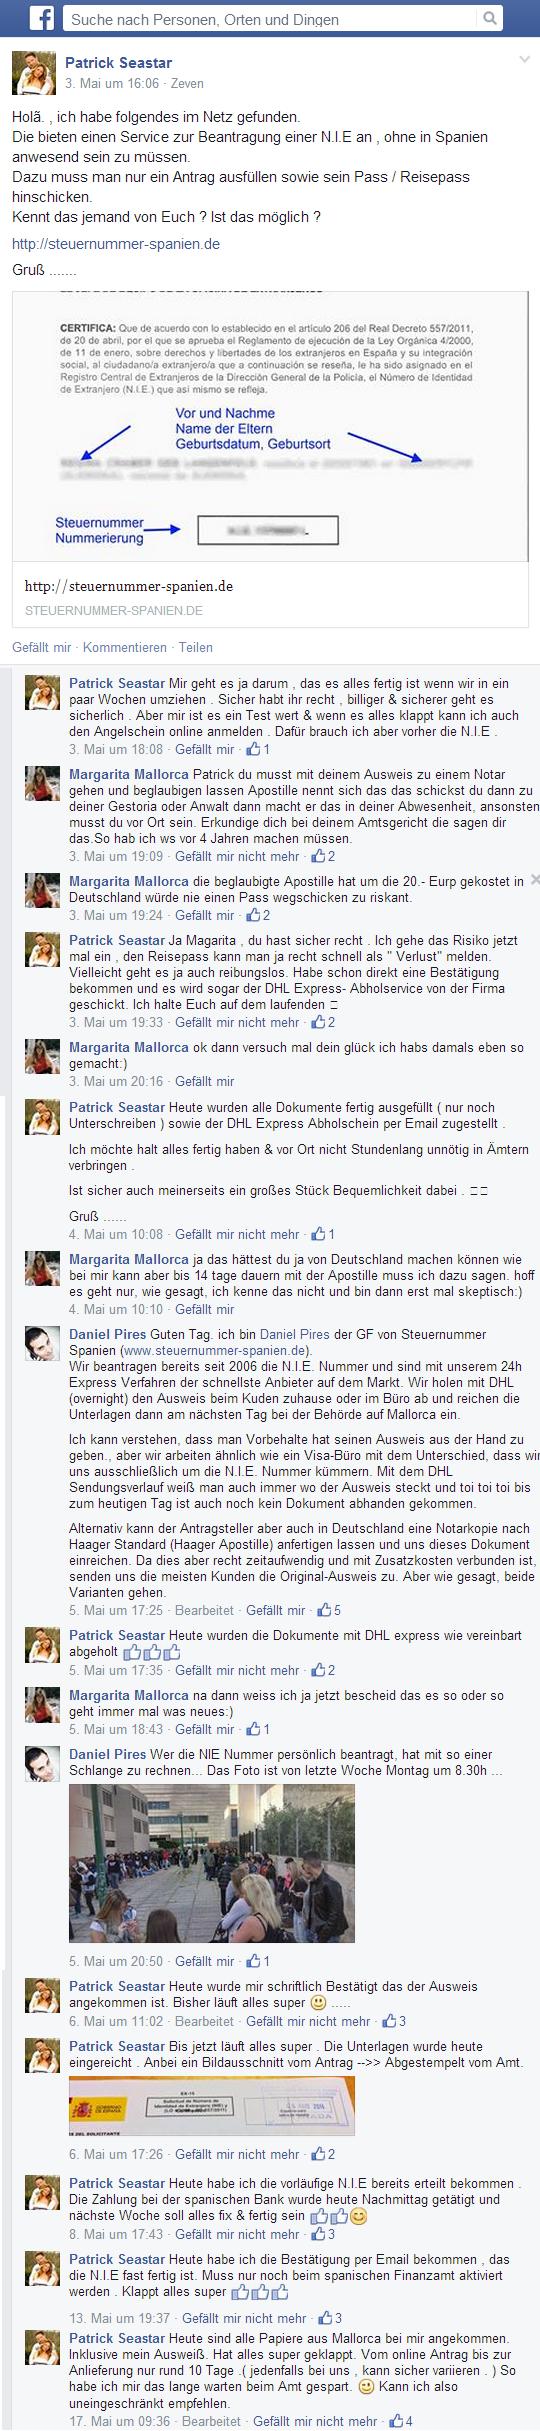 Facebook Story Marzo 2014